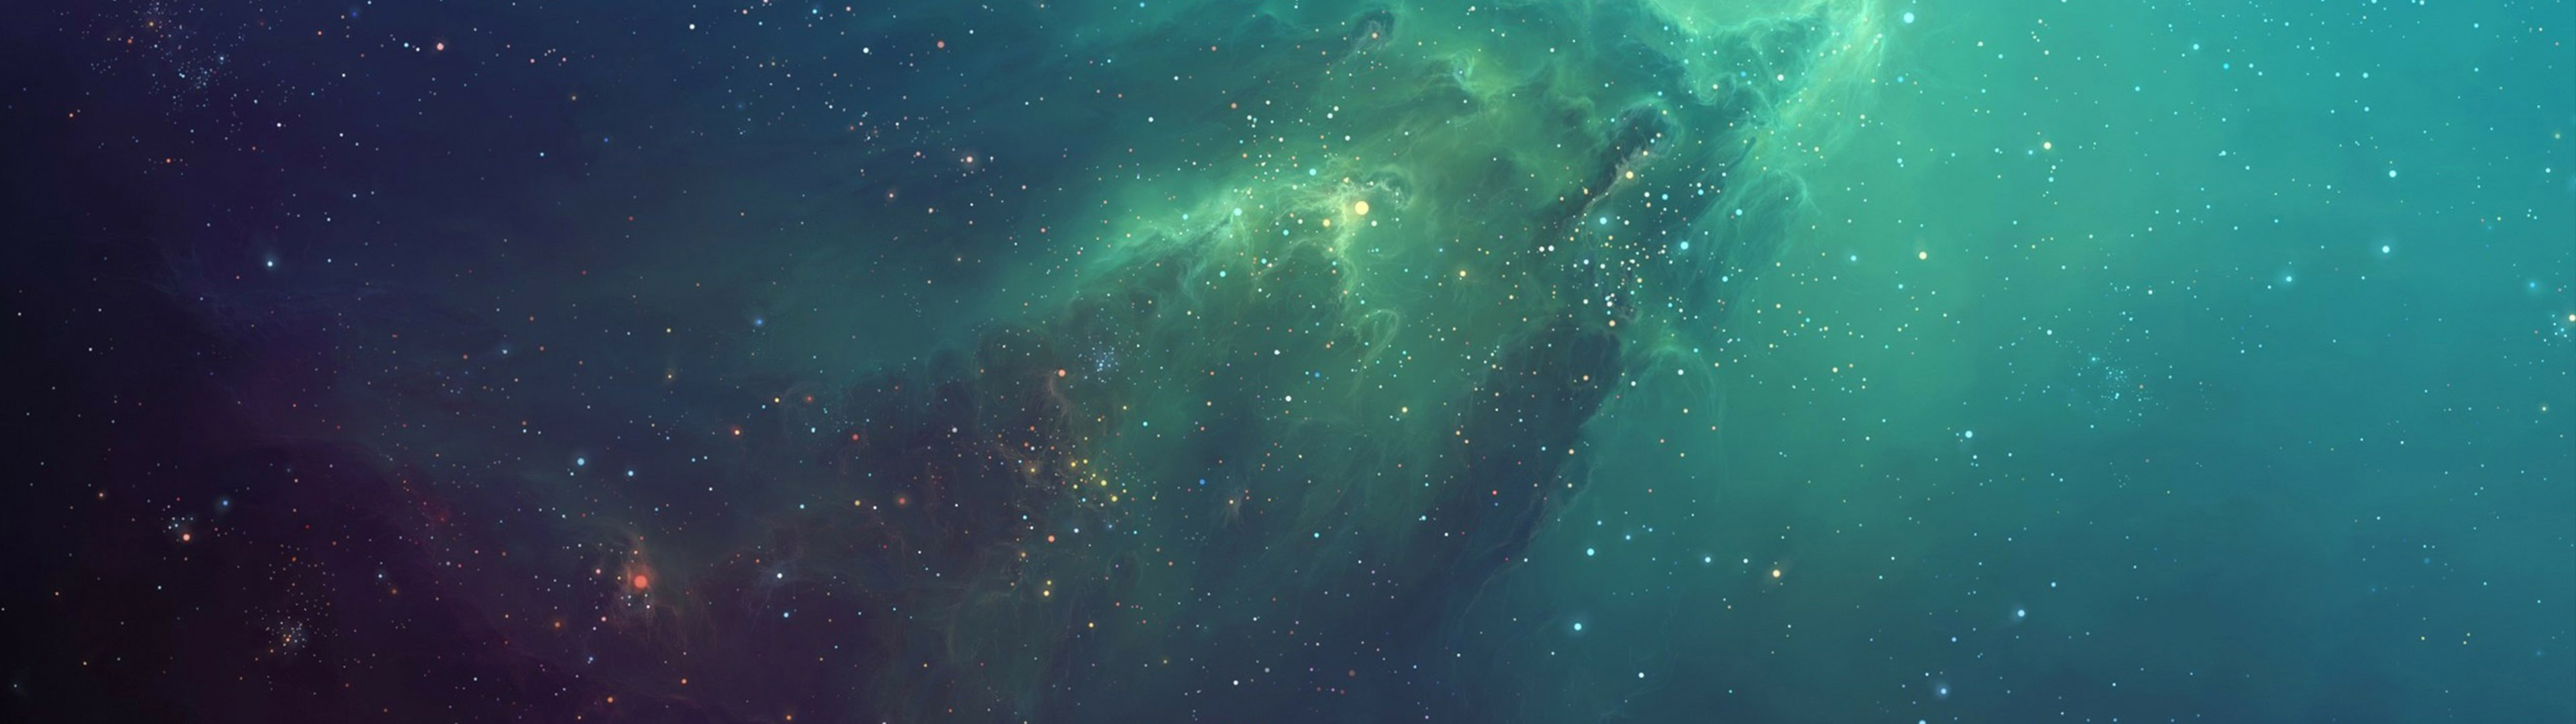 Astronomy Galaxy Nebula Night Outdoors Resized By Ze Robot